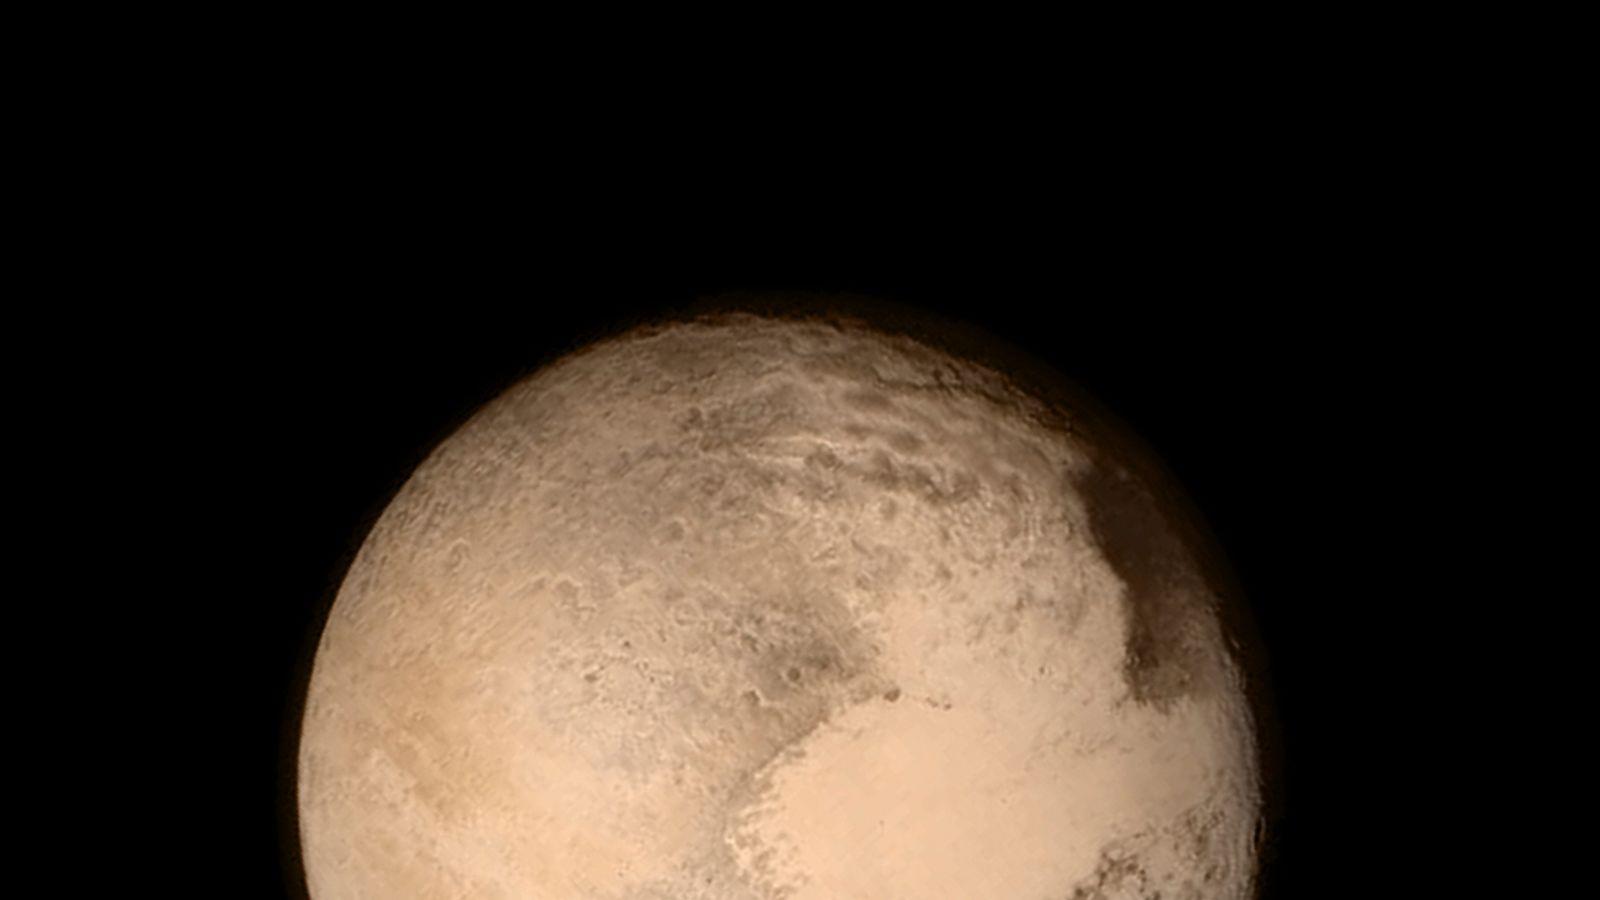 Kerberos Moon Of Plluto: Pluto May Have Huge Ocean Under Icy Surface, NASA Evidence